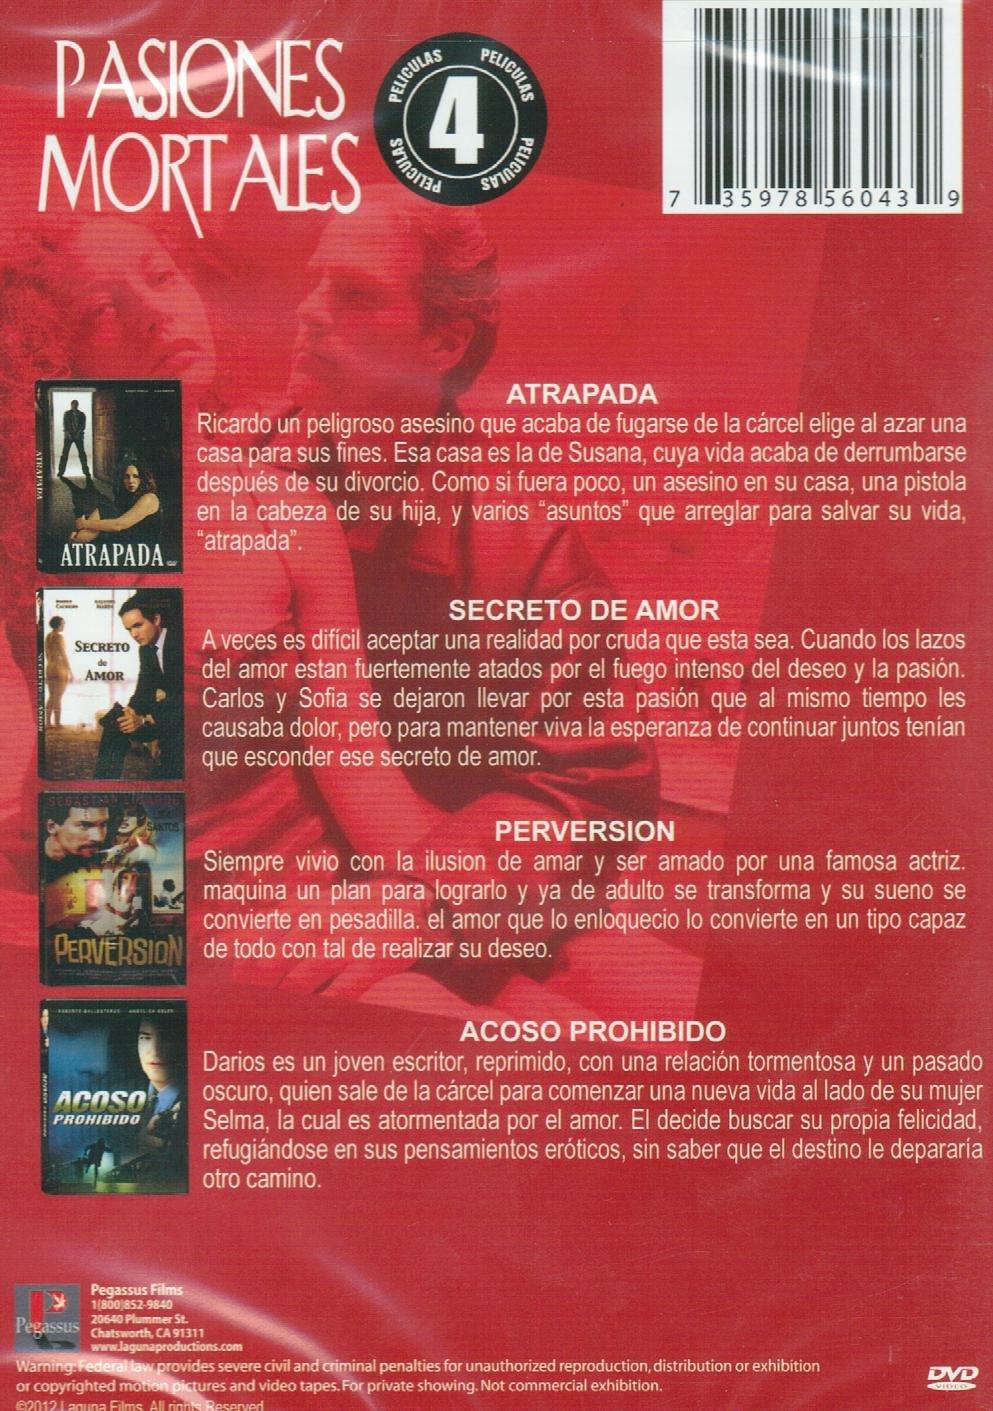 Amazon.com: PASIONES MORTALES 4 PACK:ATRAPADA/SECRETO DE ...